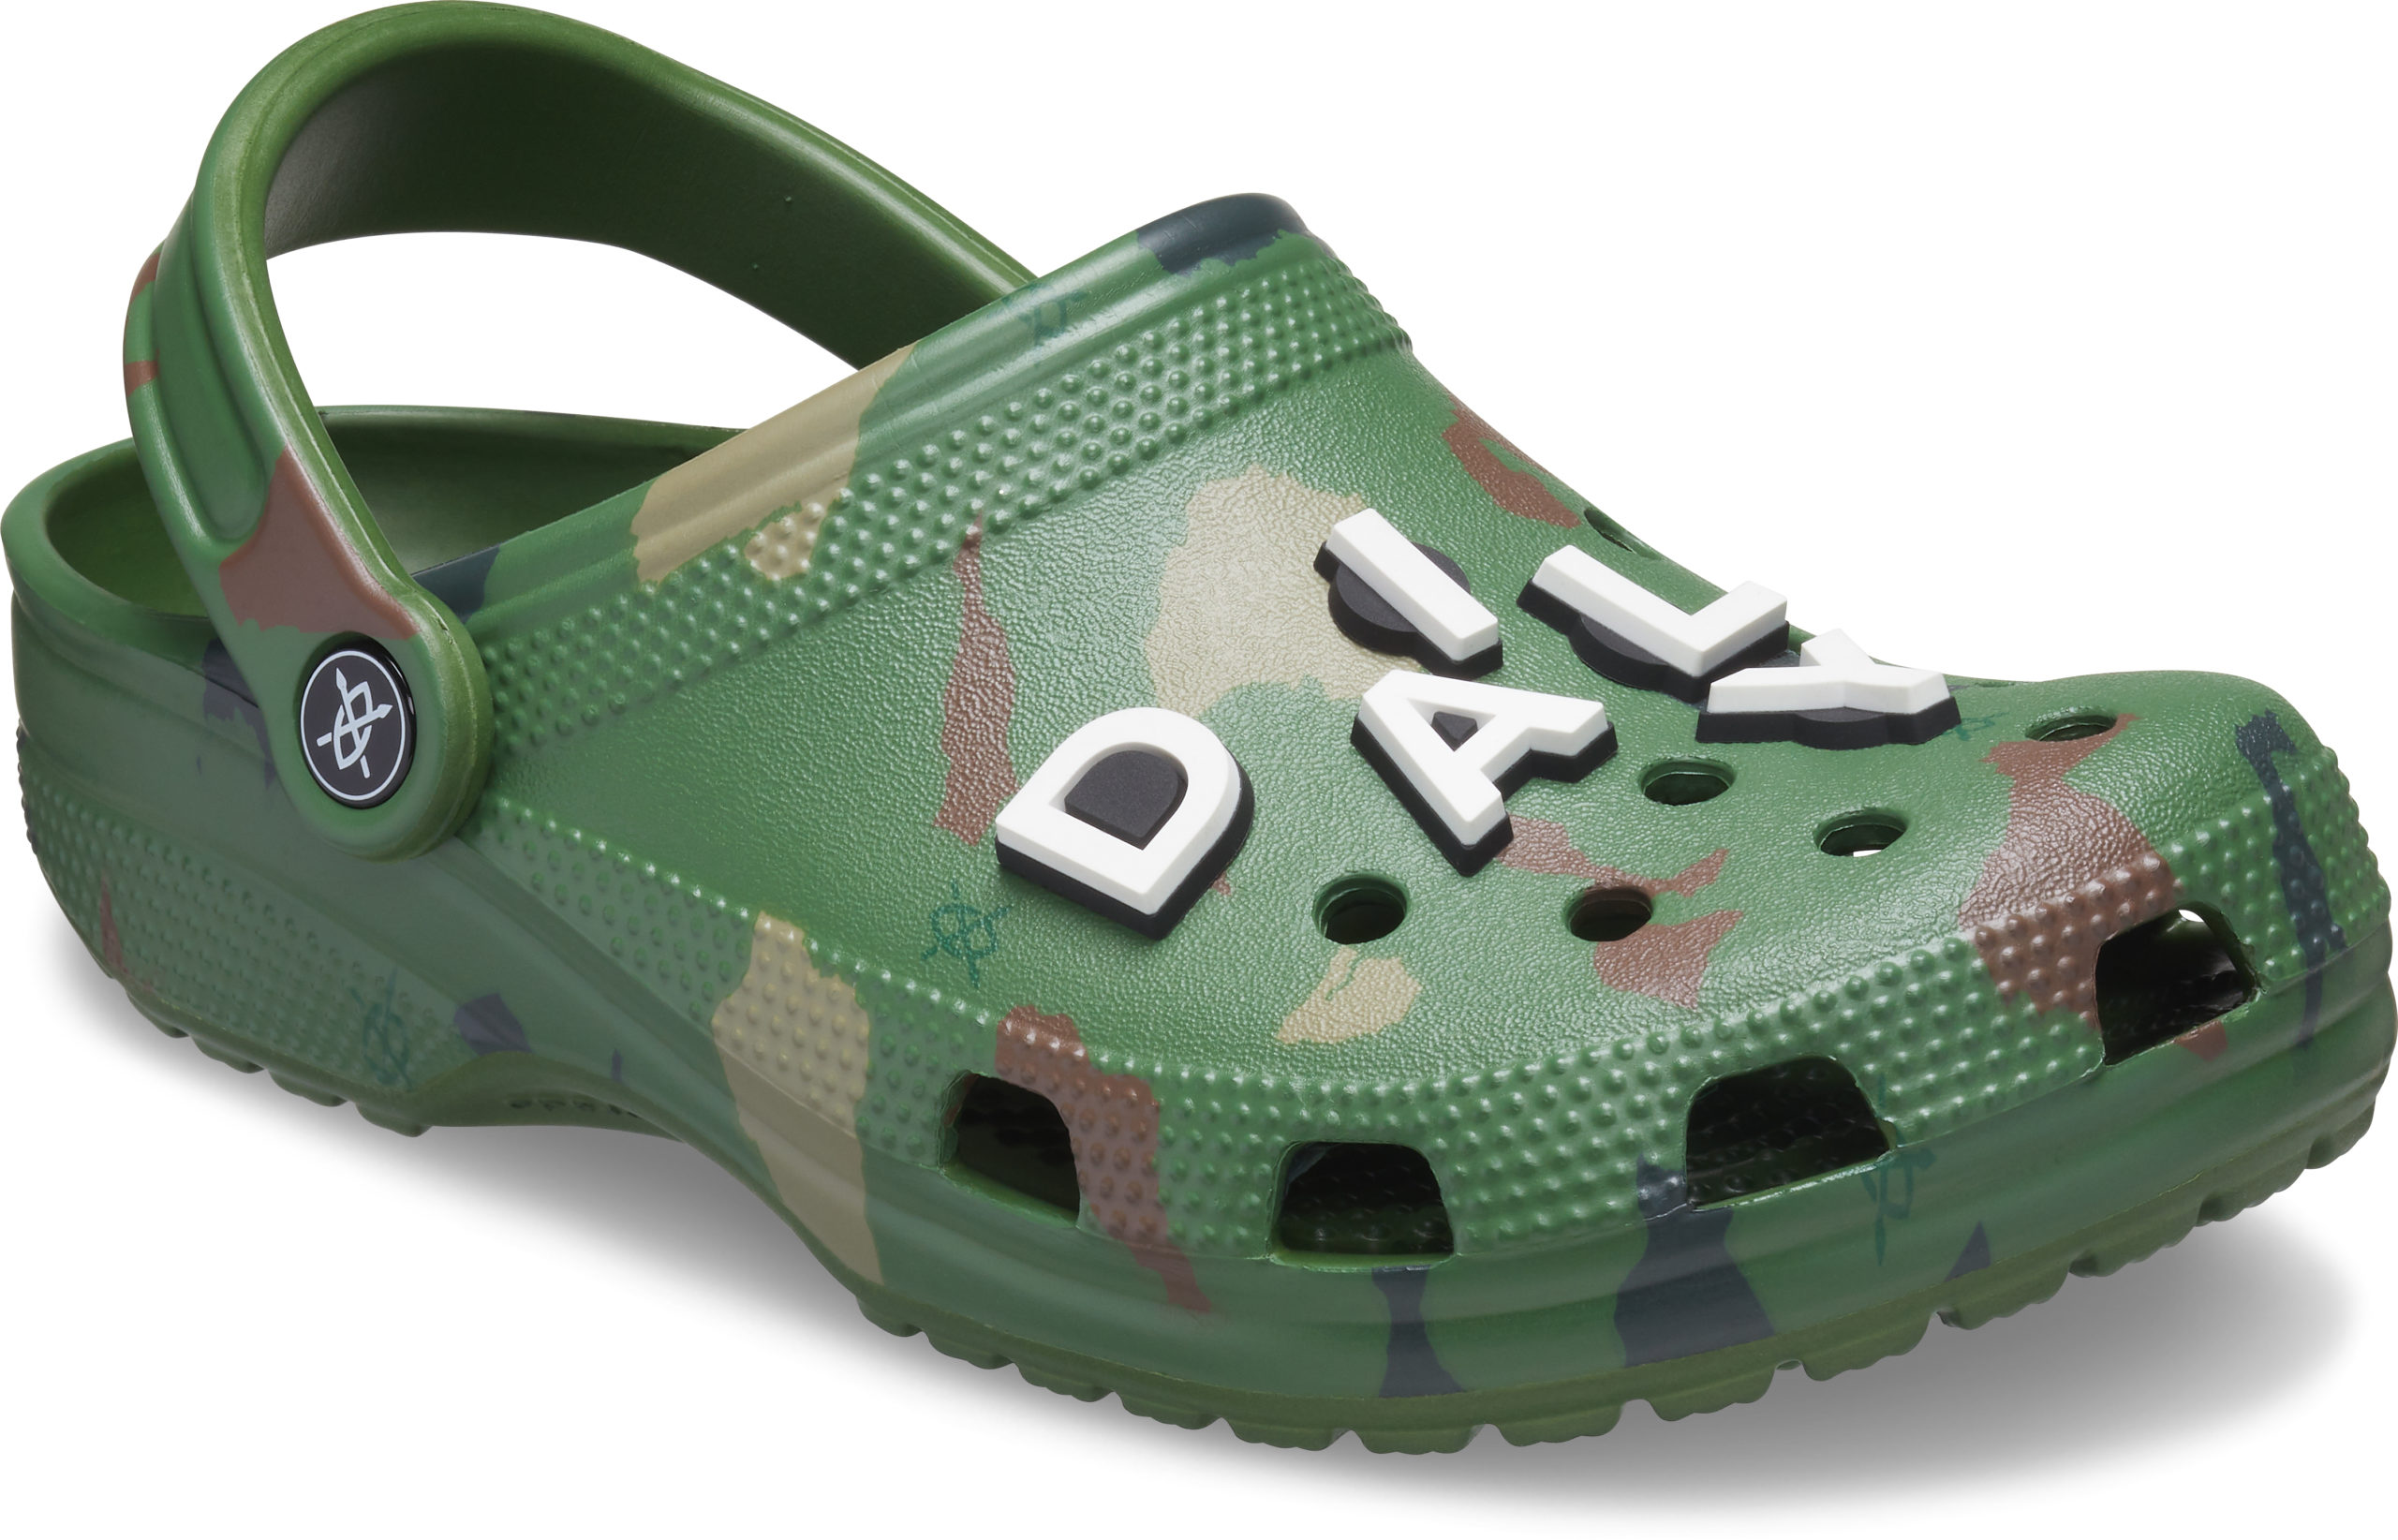 Crocs Classic Clog Daily Paper - 207250-CMO